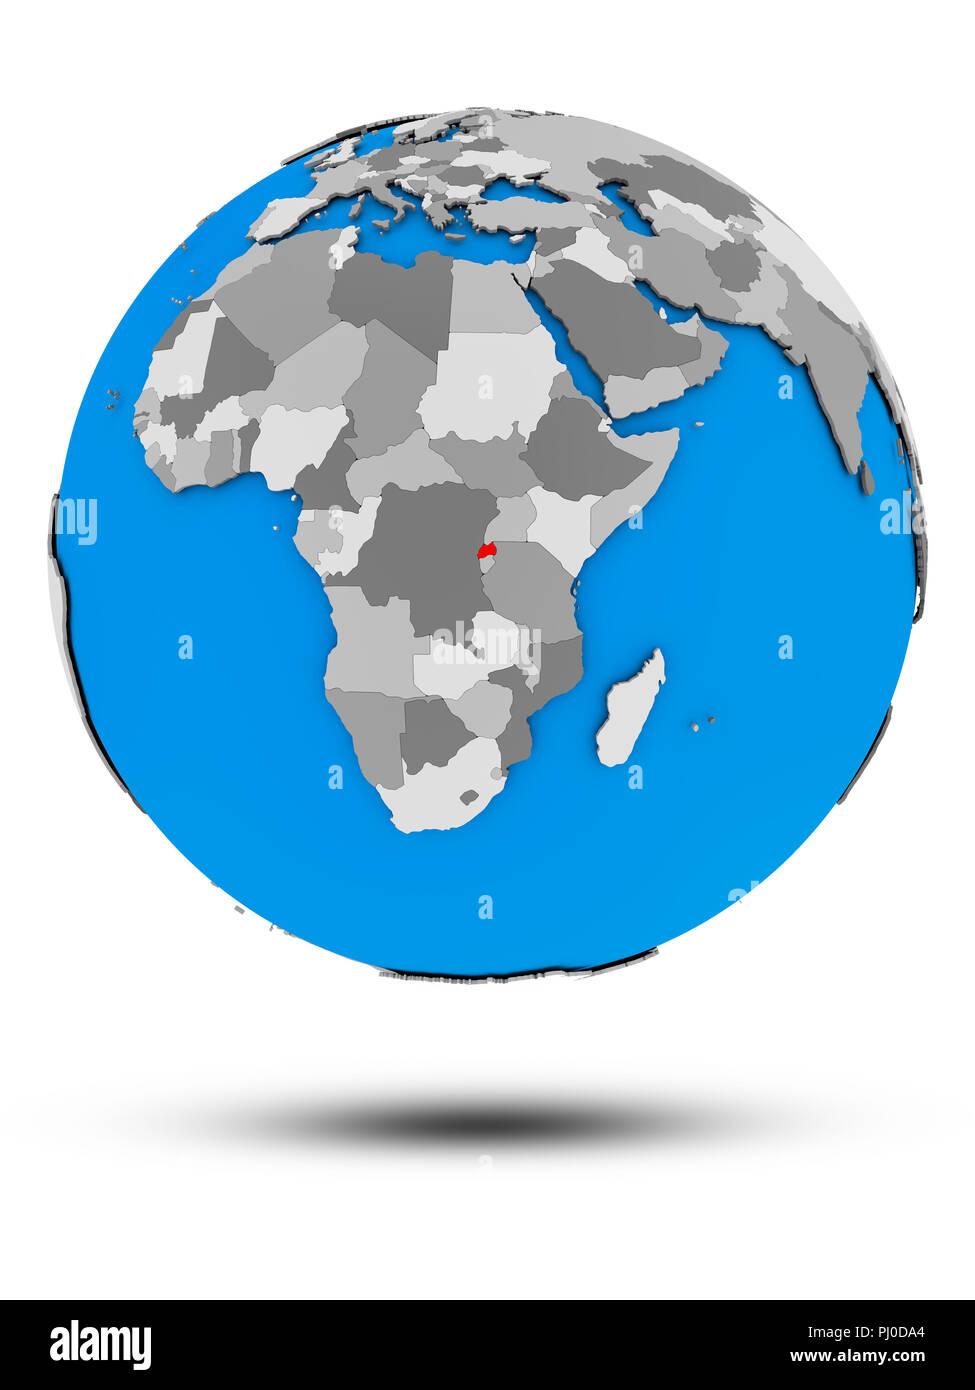 Rwanda on political globe with shadow isolated on white background. 3D illustration. - Stock Image